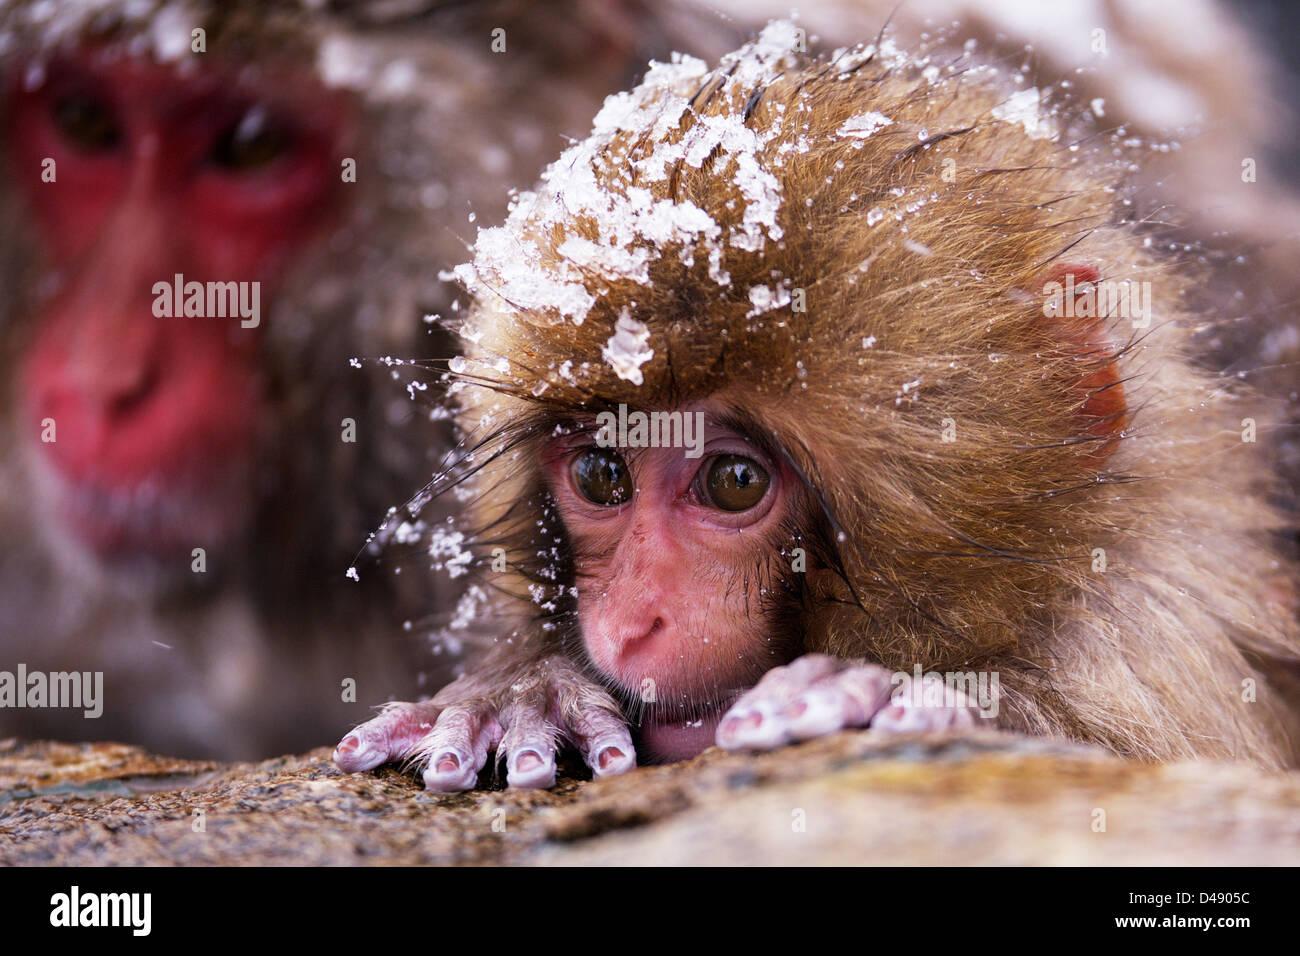 Baby Snow Monkey Stockbild